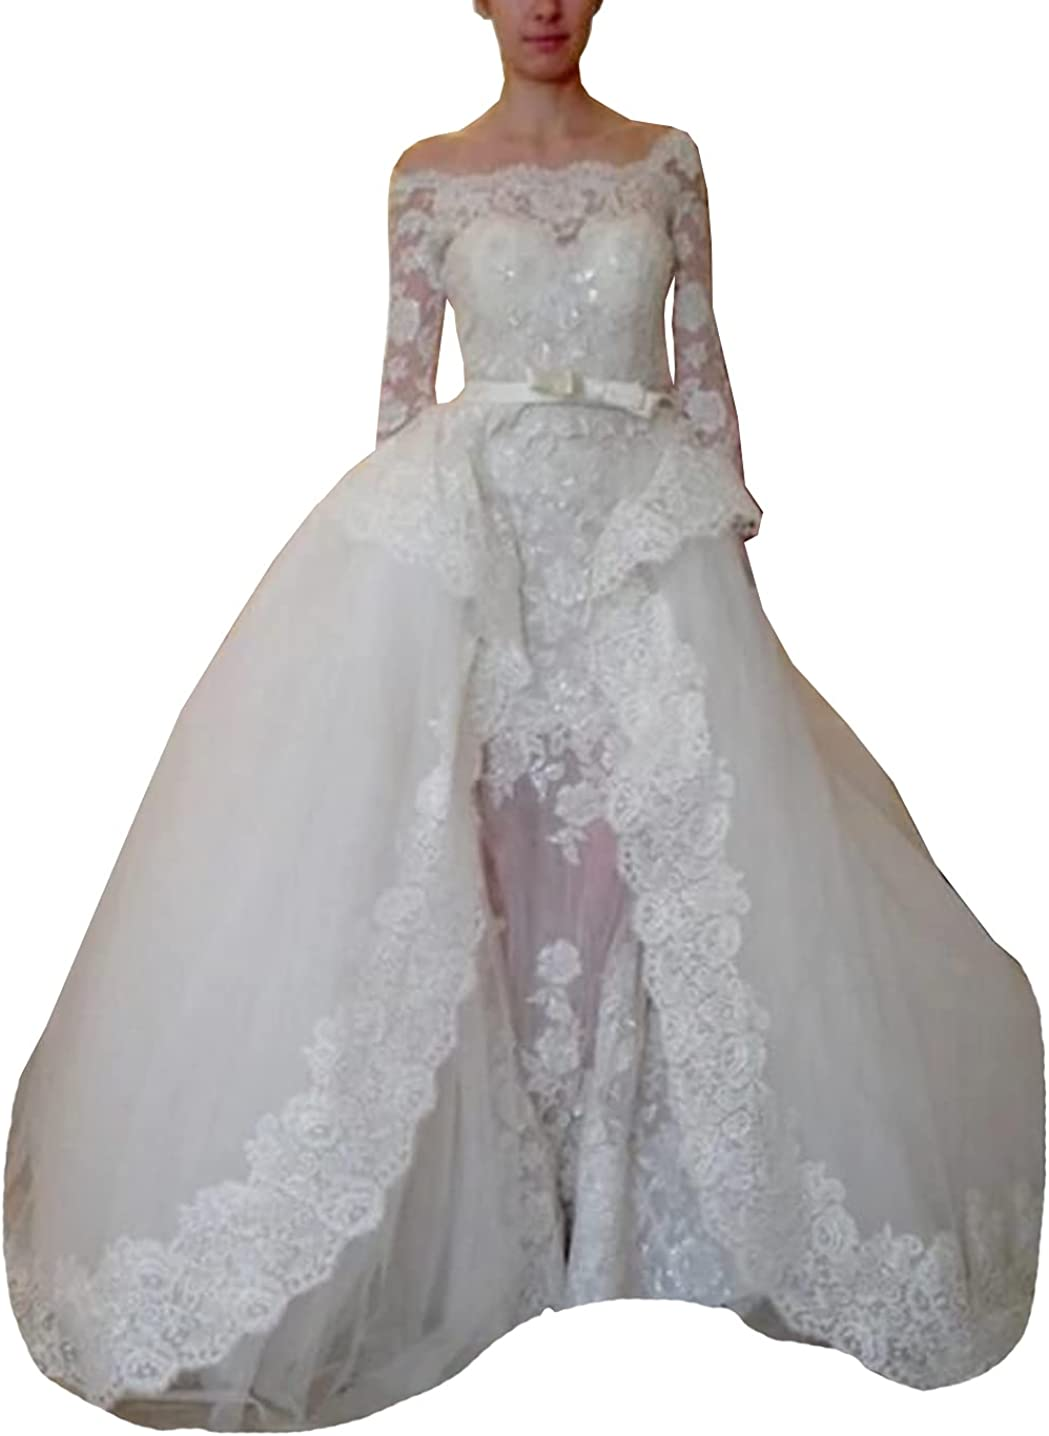 Melisa Long Sleeves Lace Sequins Corset Bridal Gowns Detachable Train Mermaid Wedding Dresses for Bride